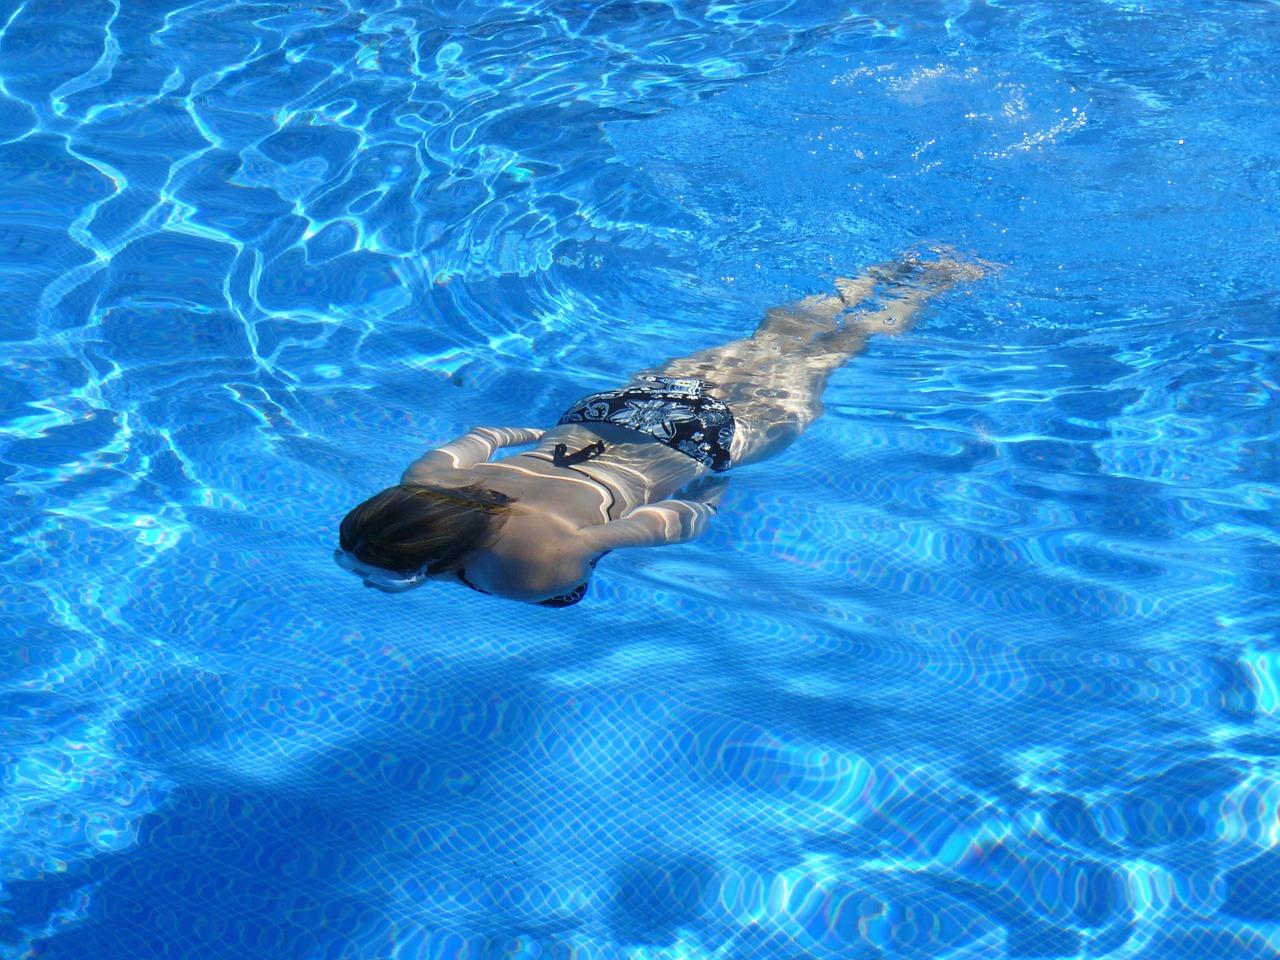 natation après grossesse